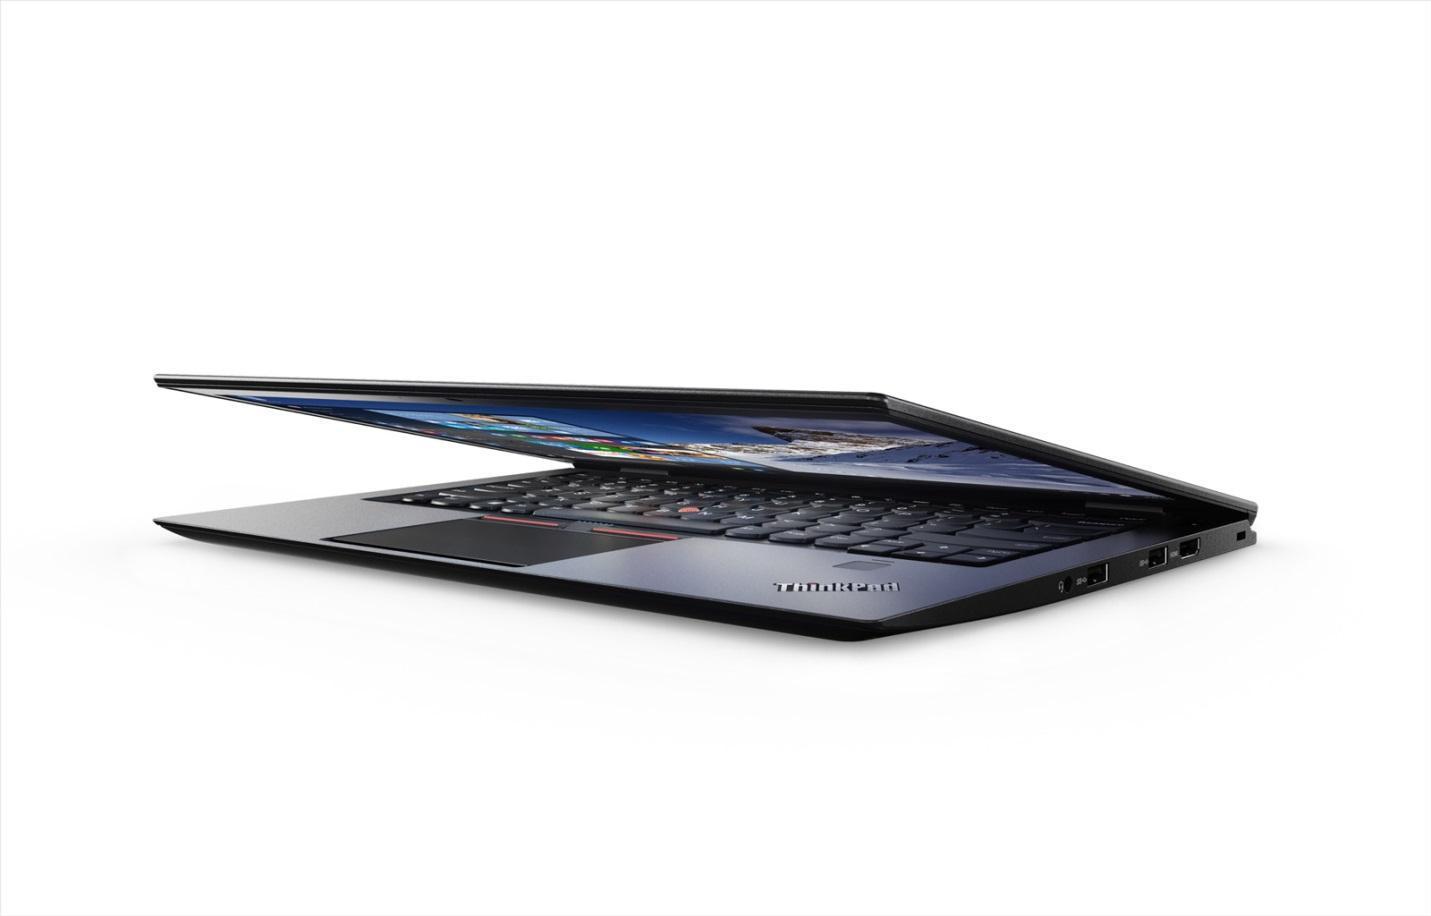 Фото2  Ультрабук ThinkPad X1 Carbon 5th Gen (20HR0069RT)